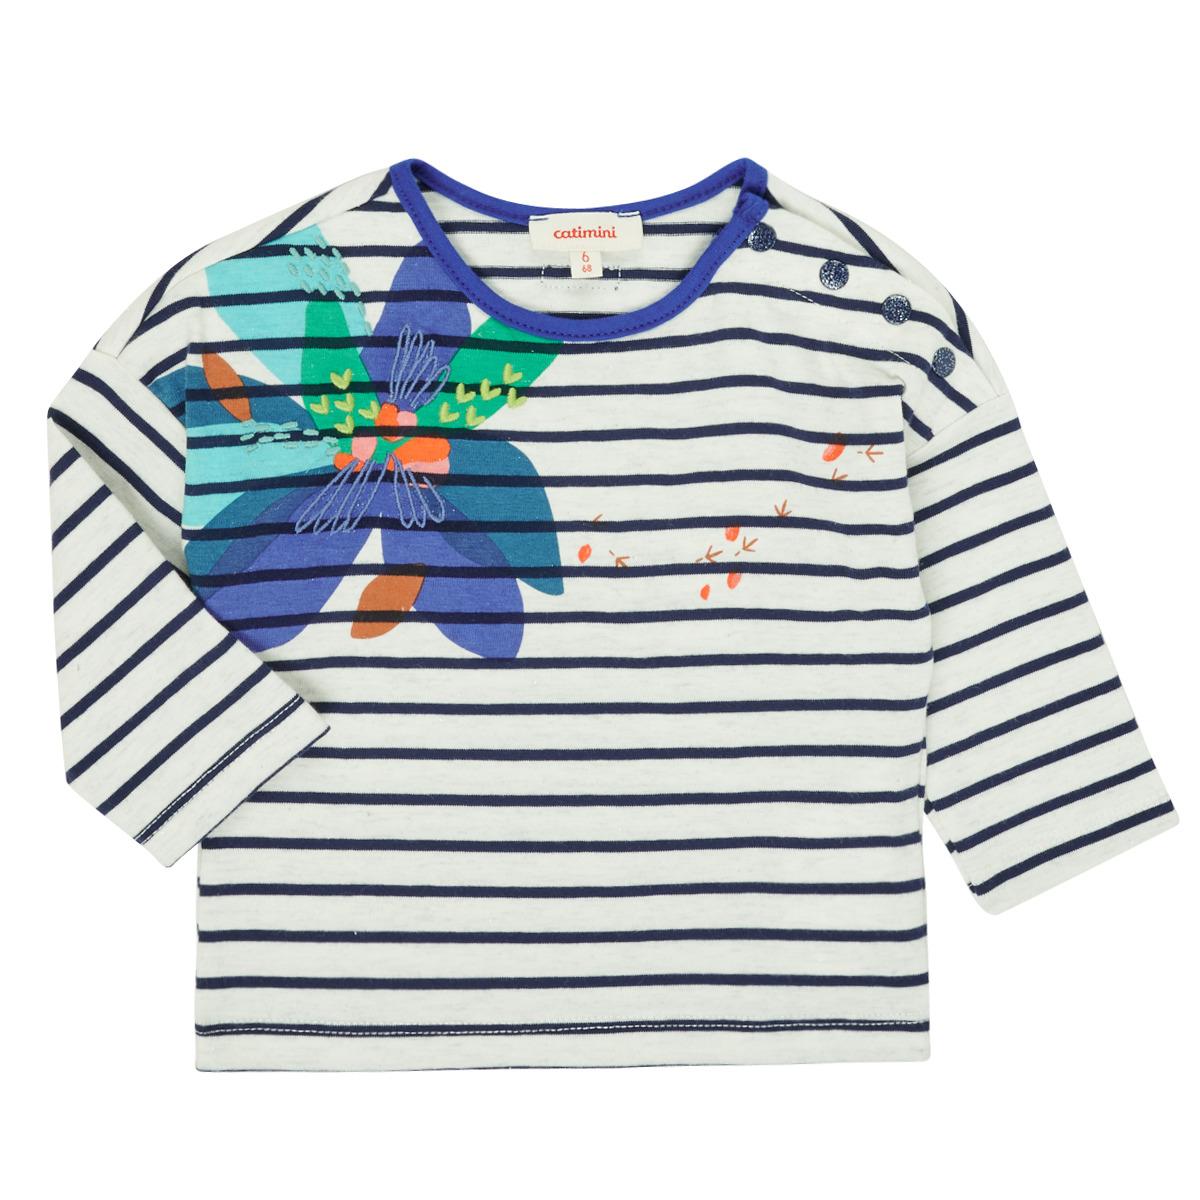 Catimini Camiseta para Beb/és